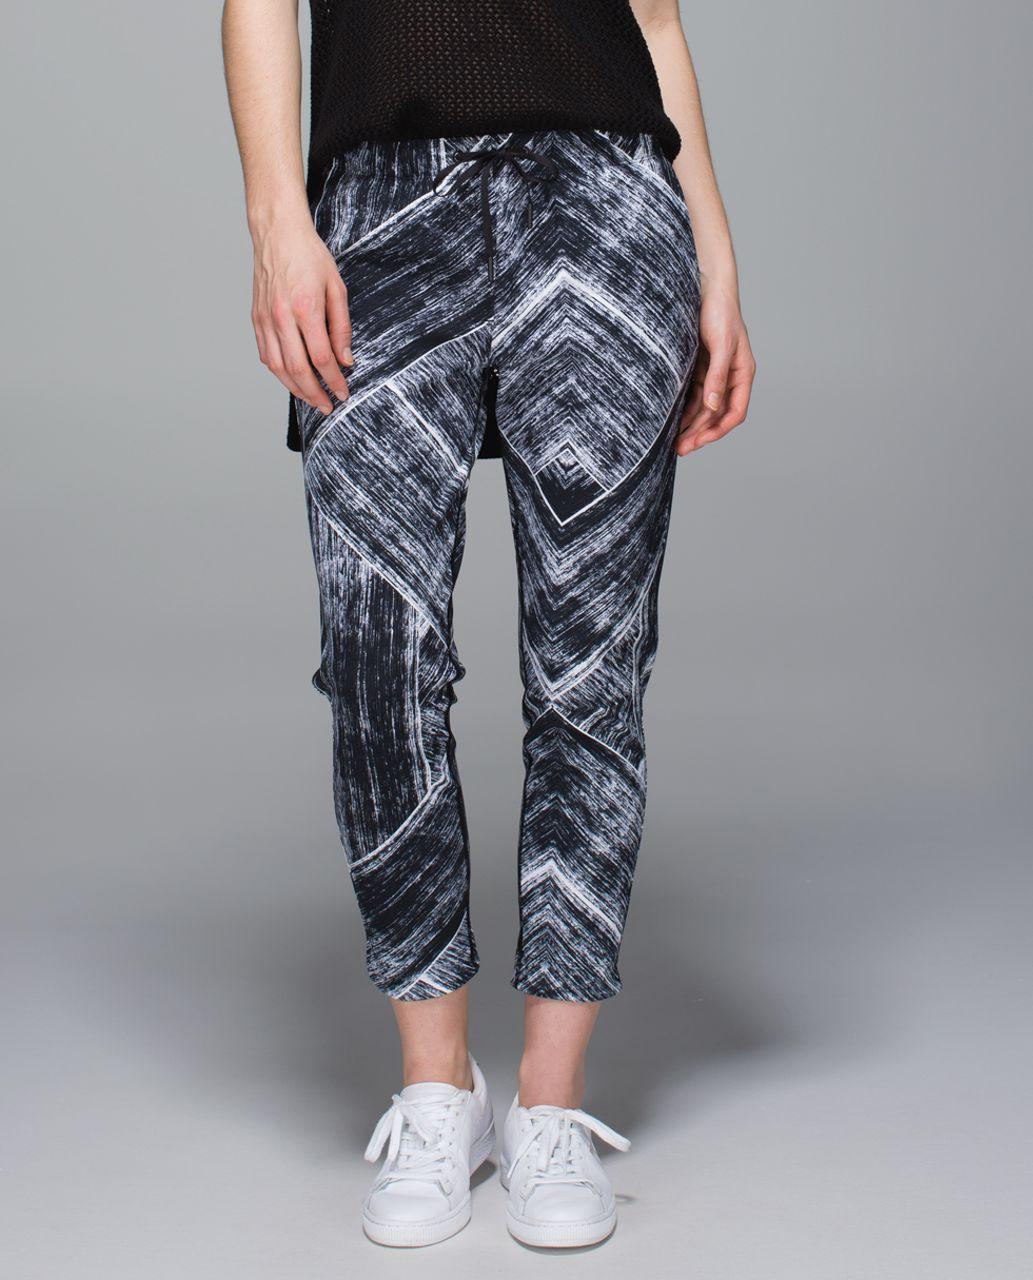 Lululemon Jet Crop (Slim Trouser) - Heat Wave White Black / Butter Pink